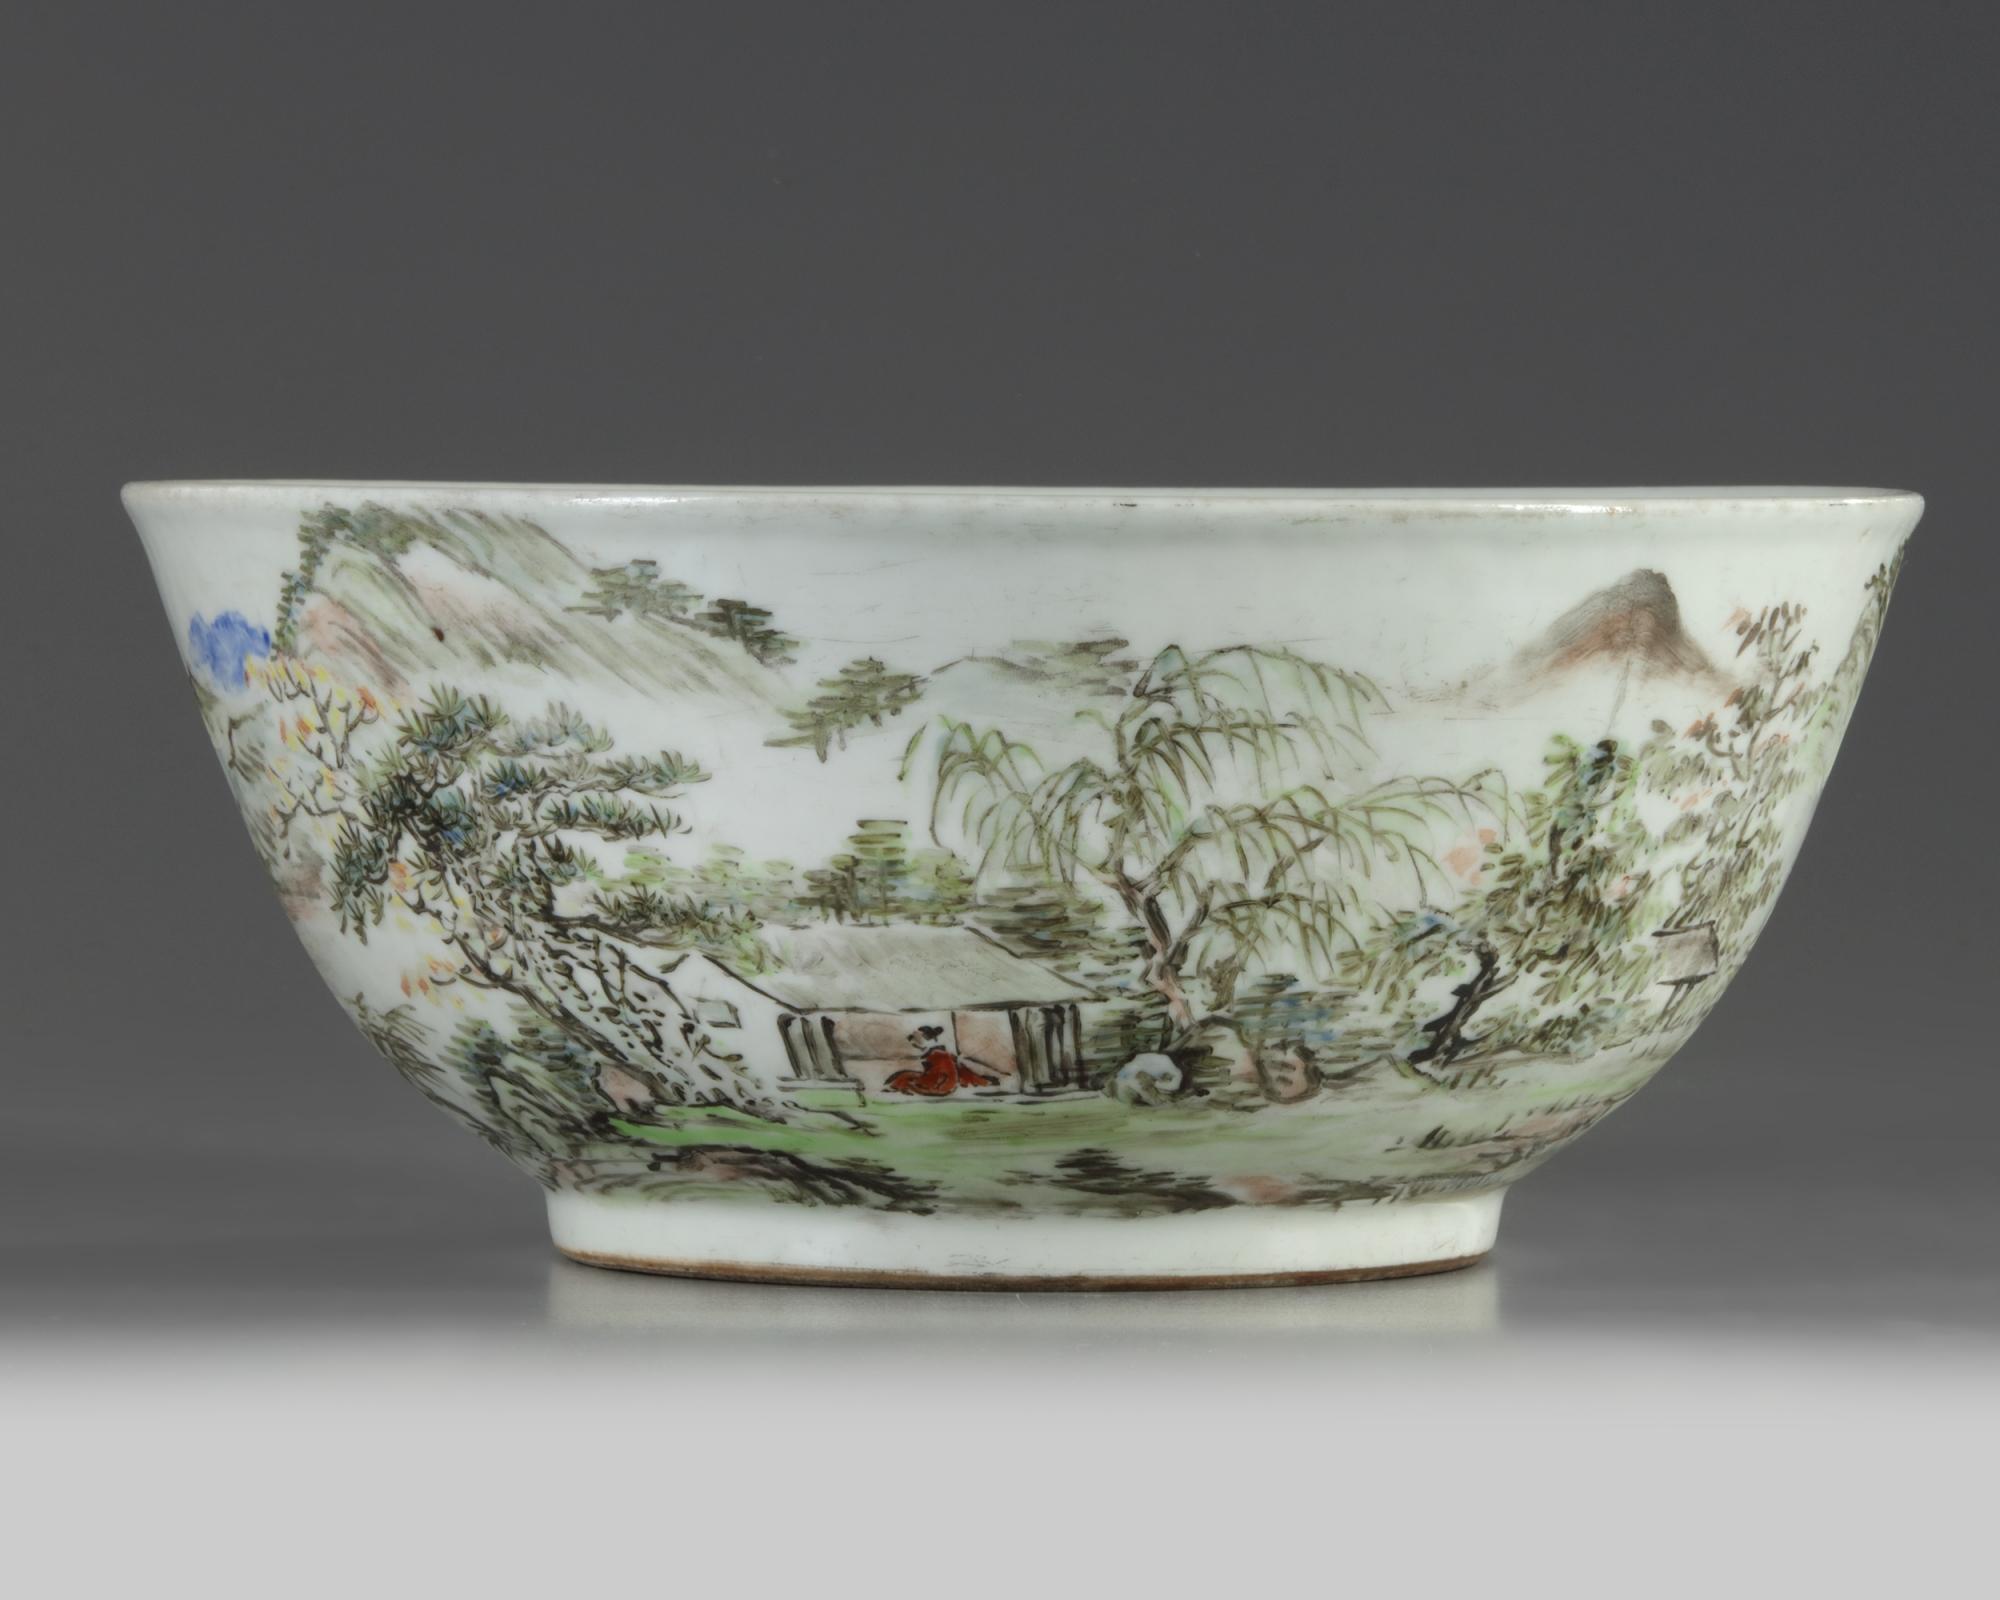 Lot 45 - A large Chinese Qianjiang-style bowl